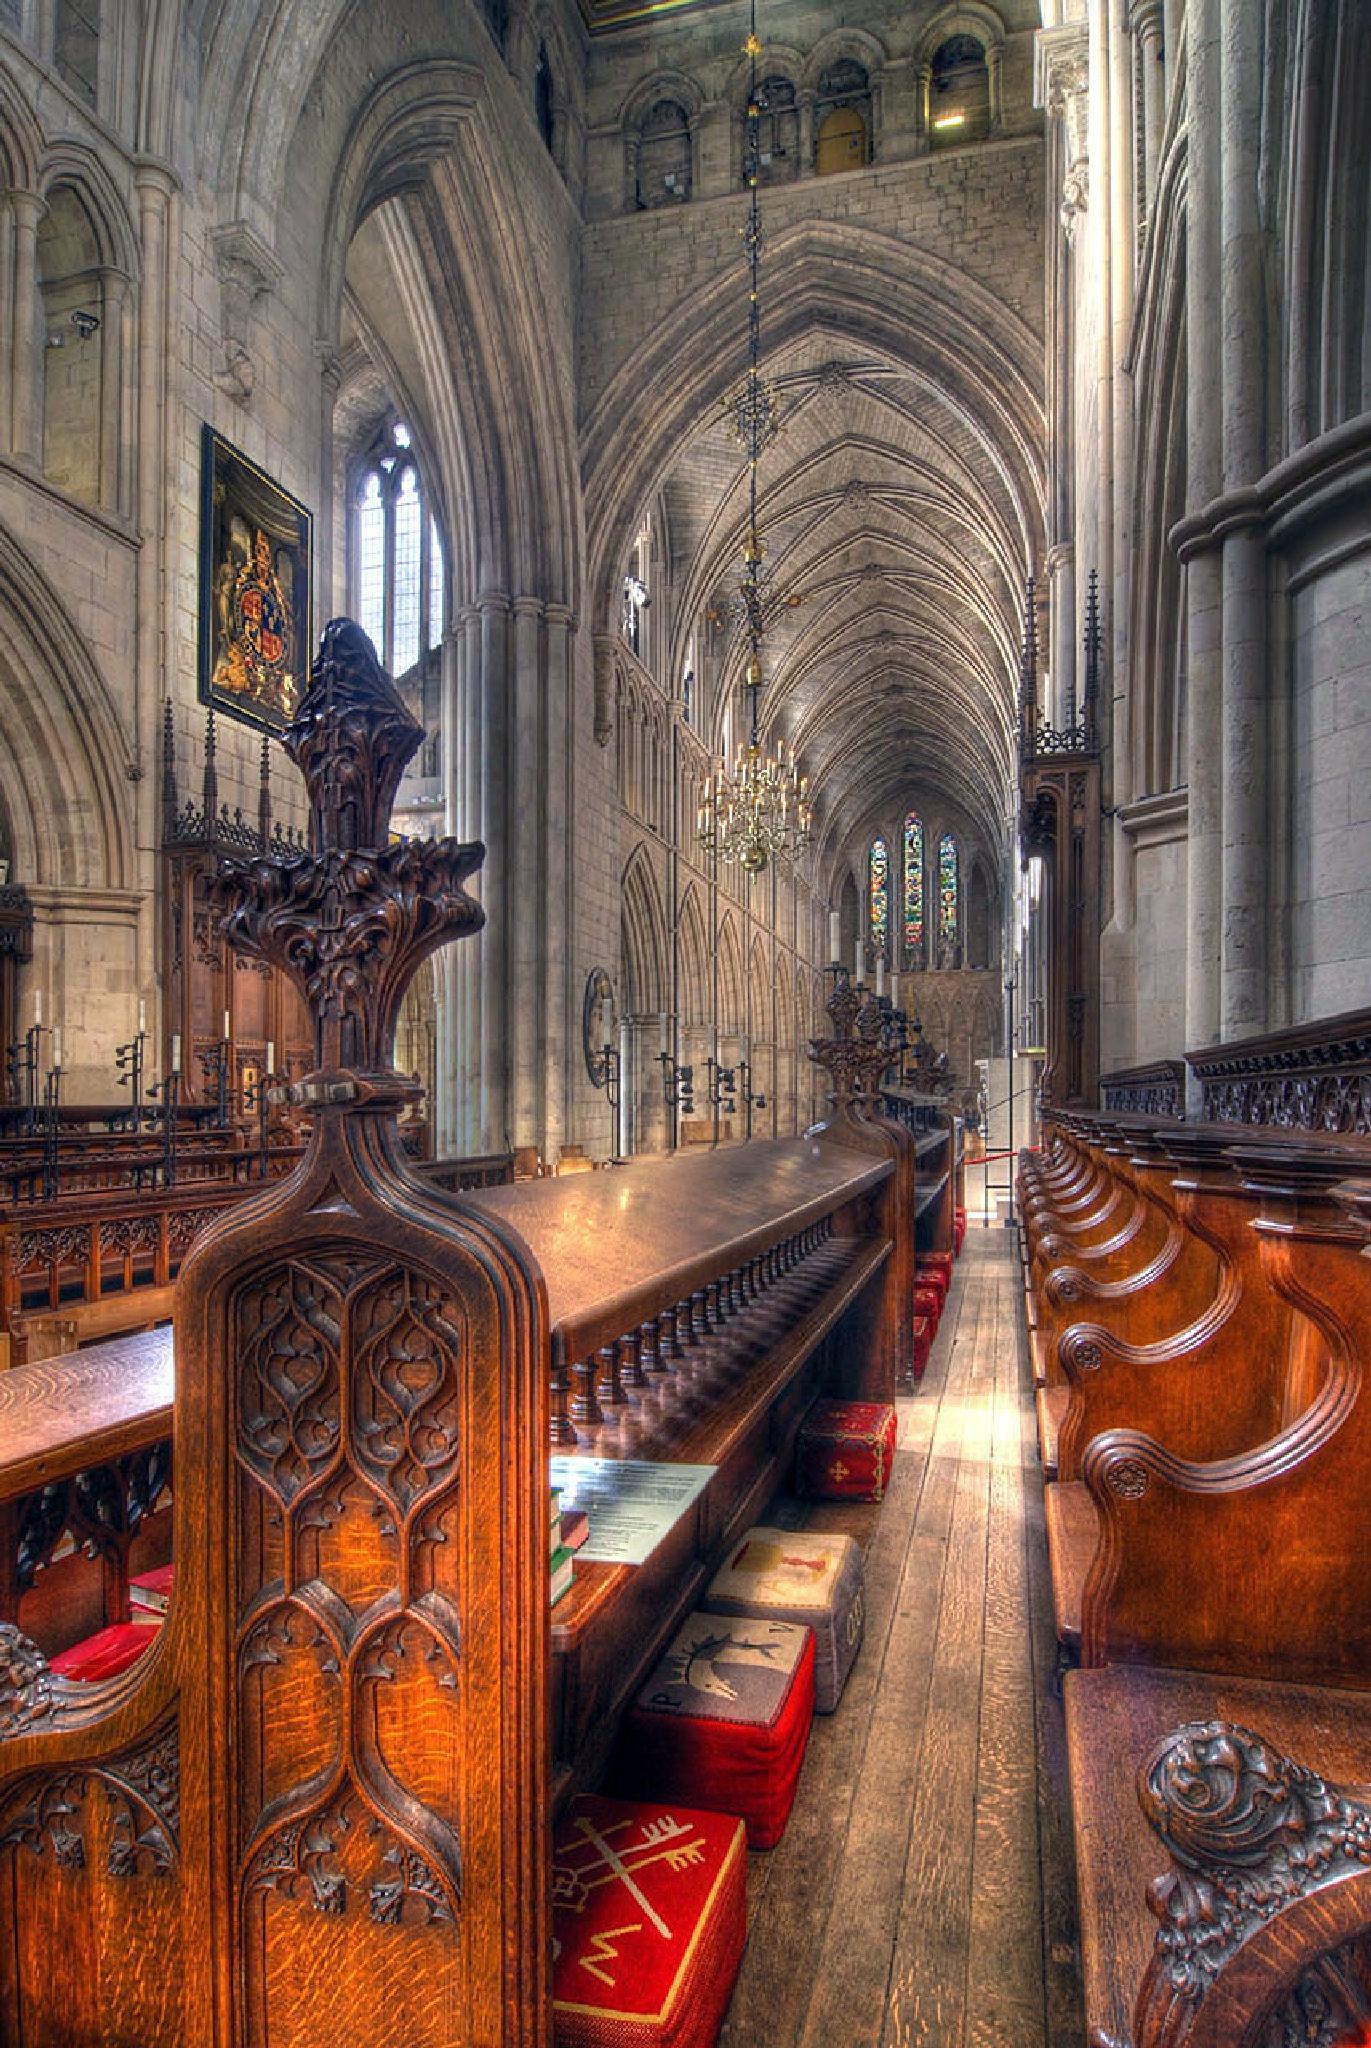 Choir Stalls by SimonBull